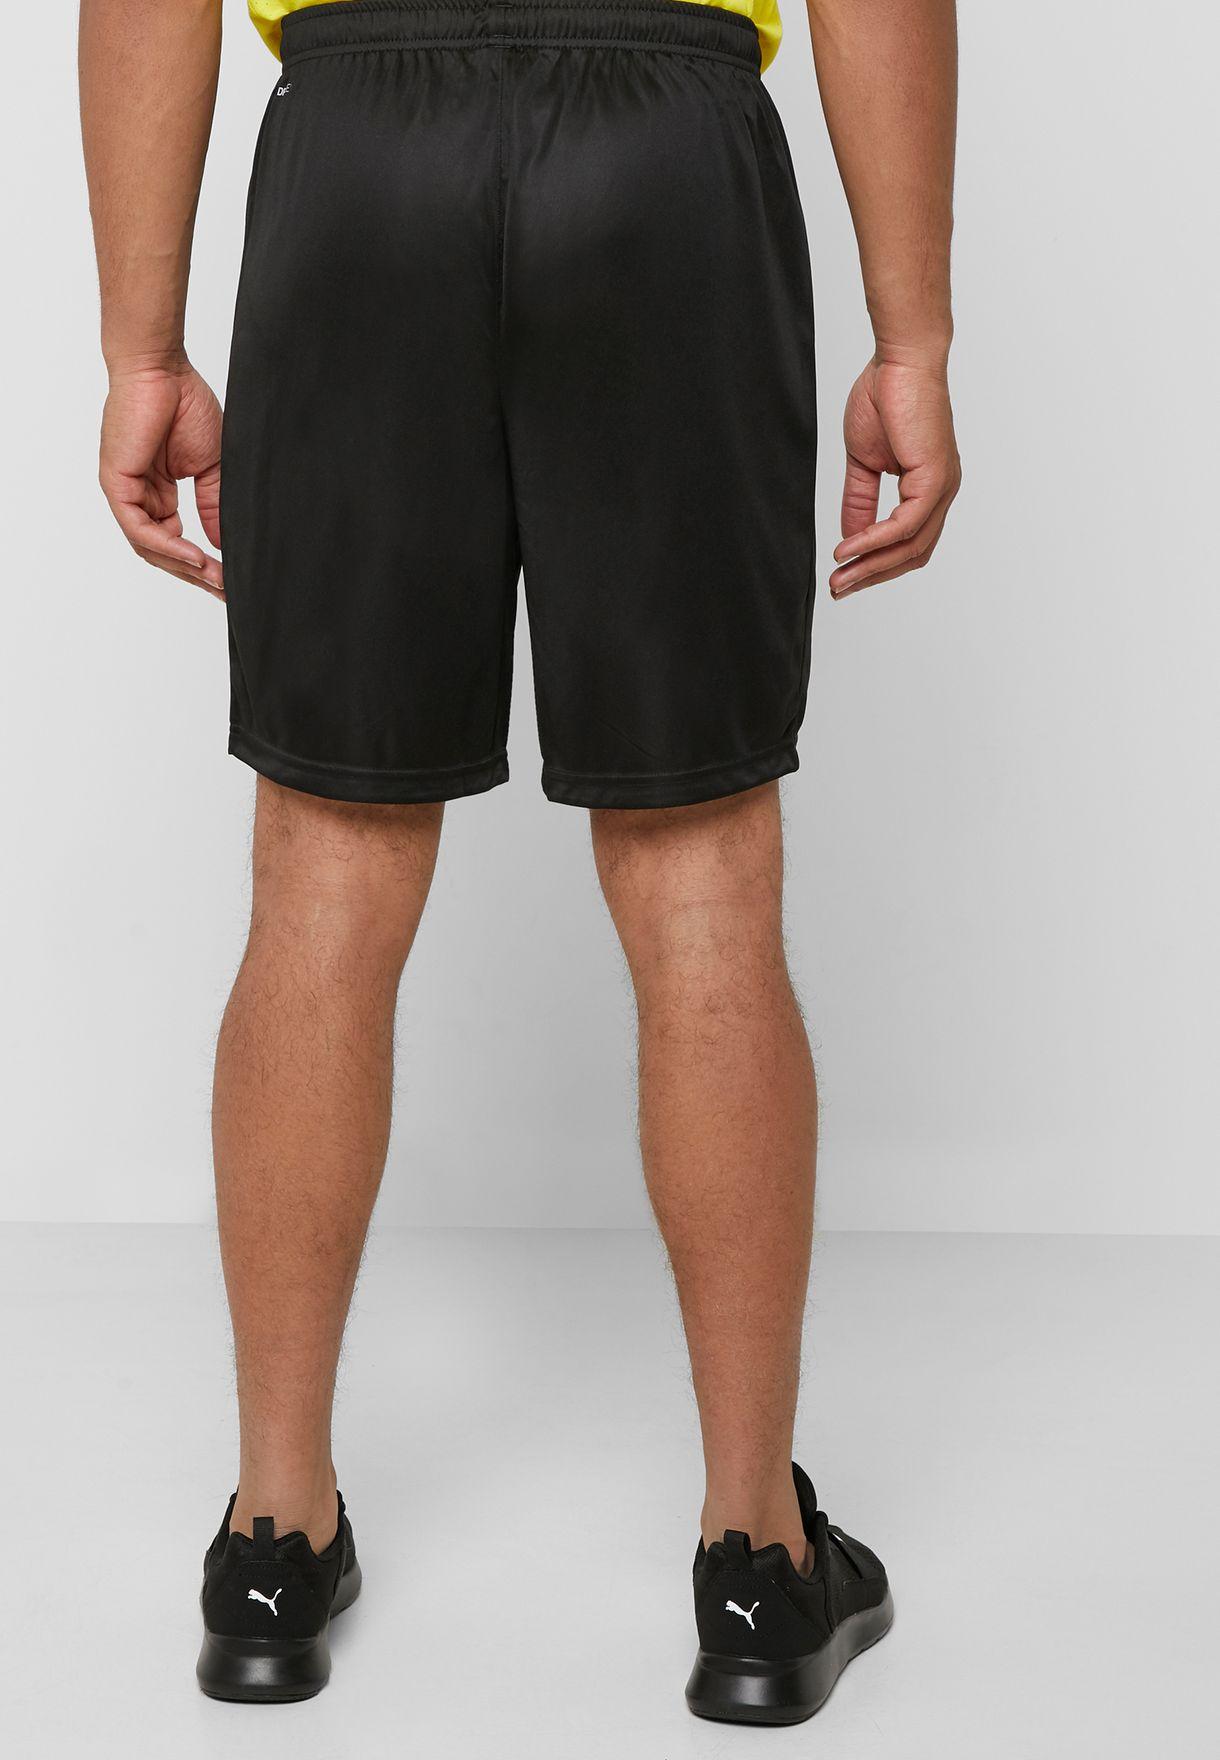 ftblPLAY Shorts